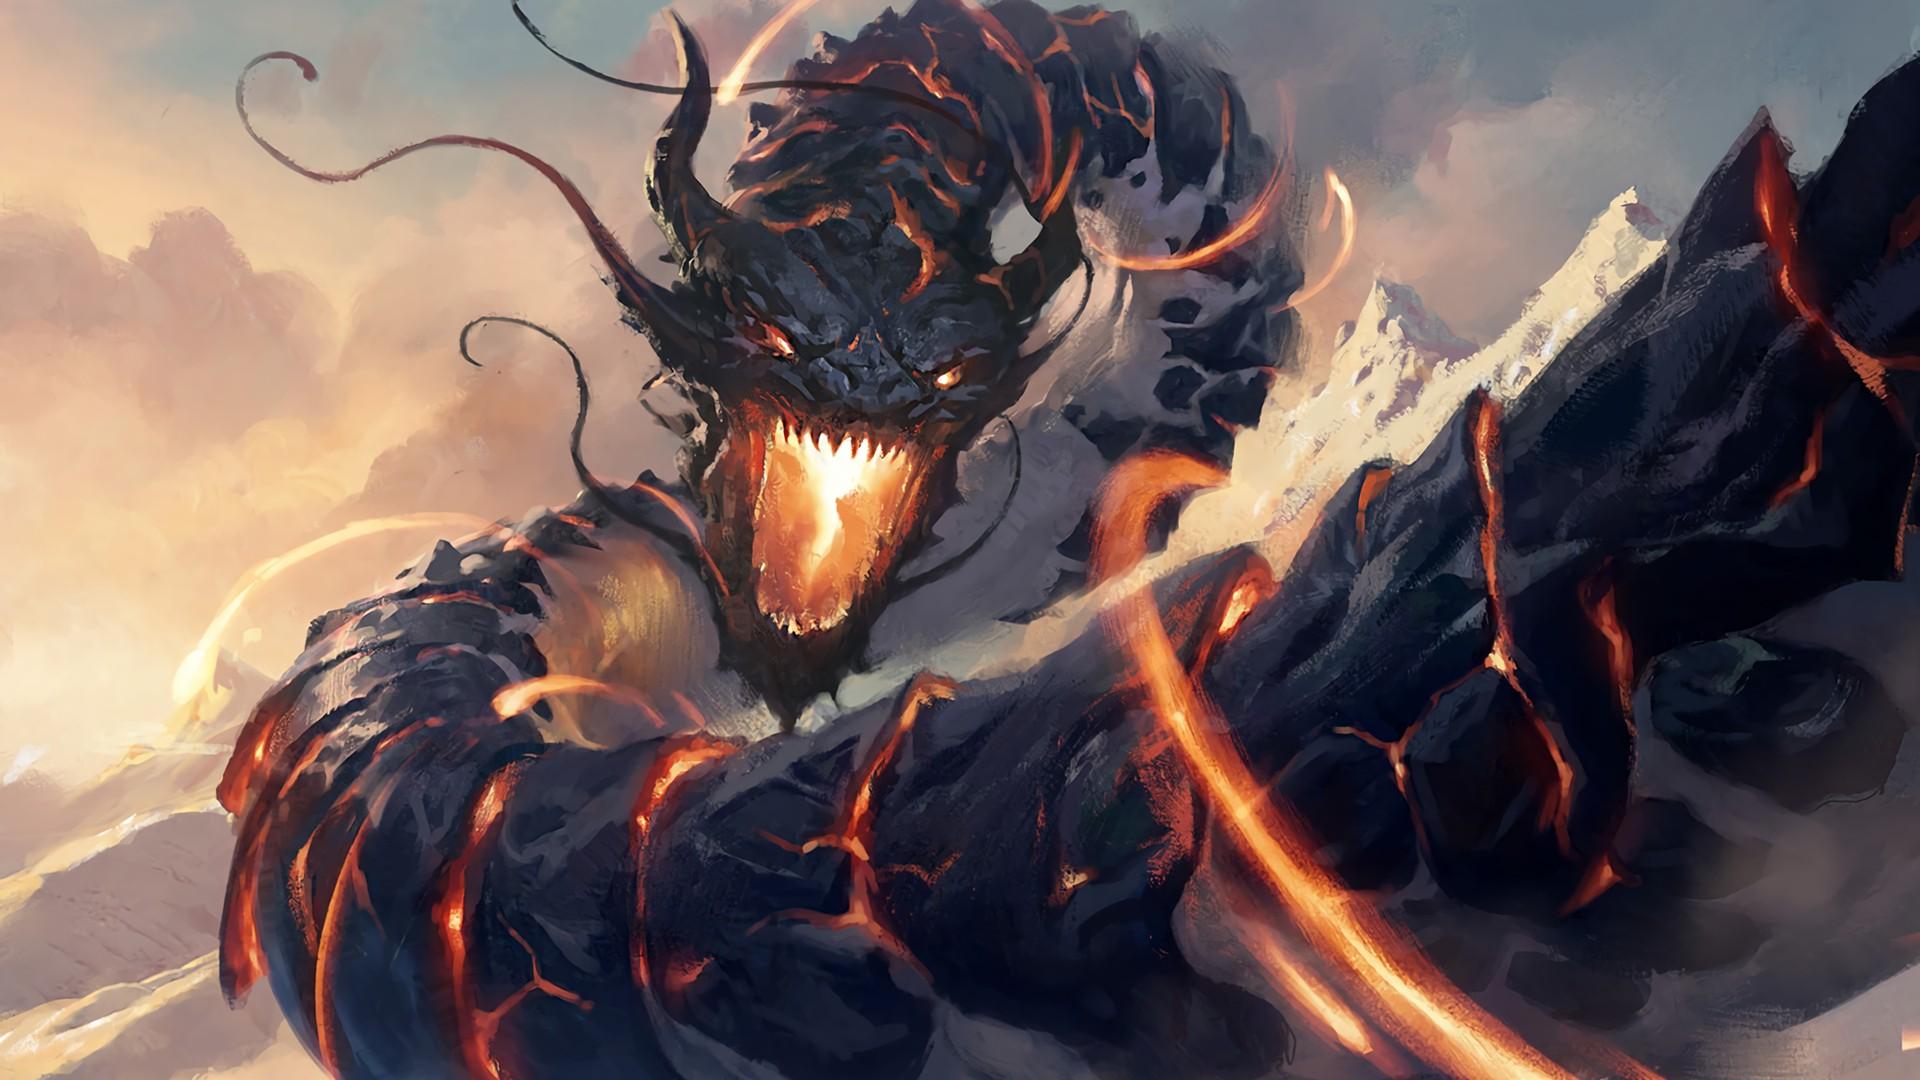 1920x1080 px digital art dragon fantasy art Magic The Gathering